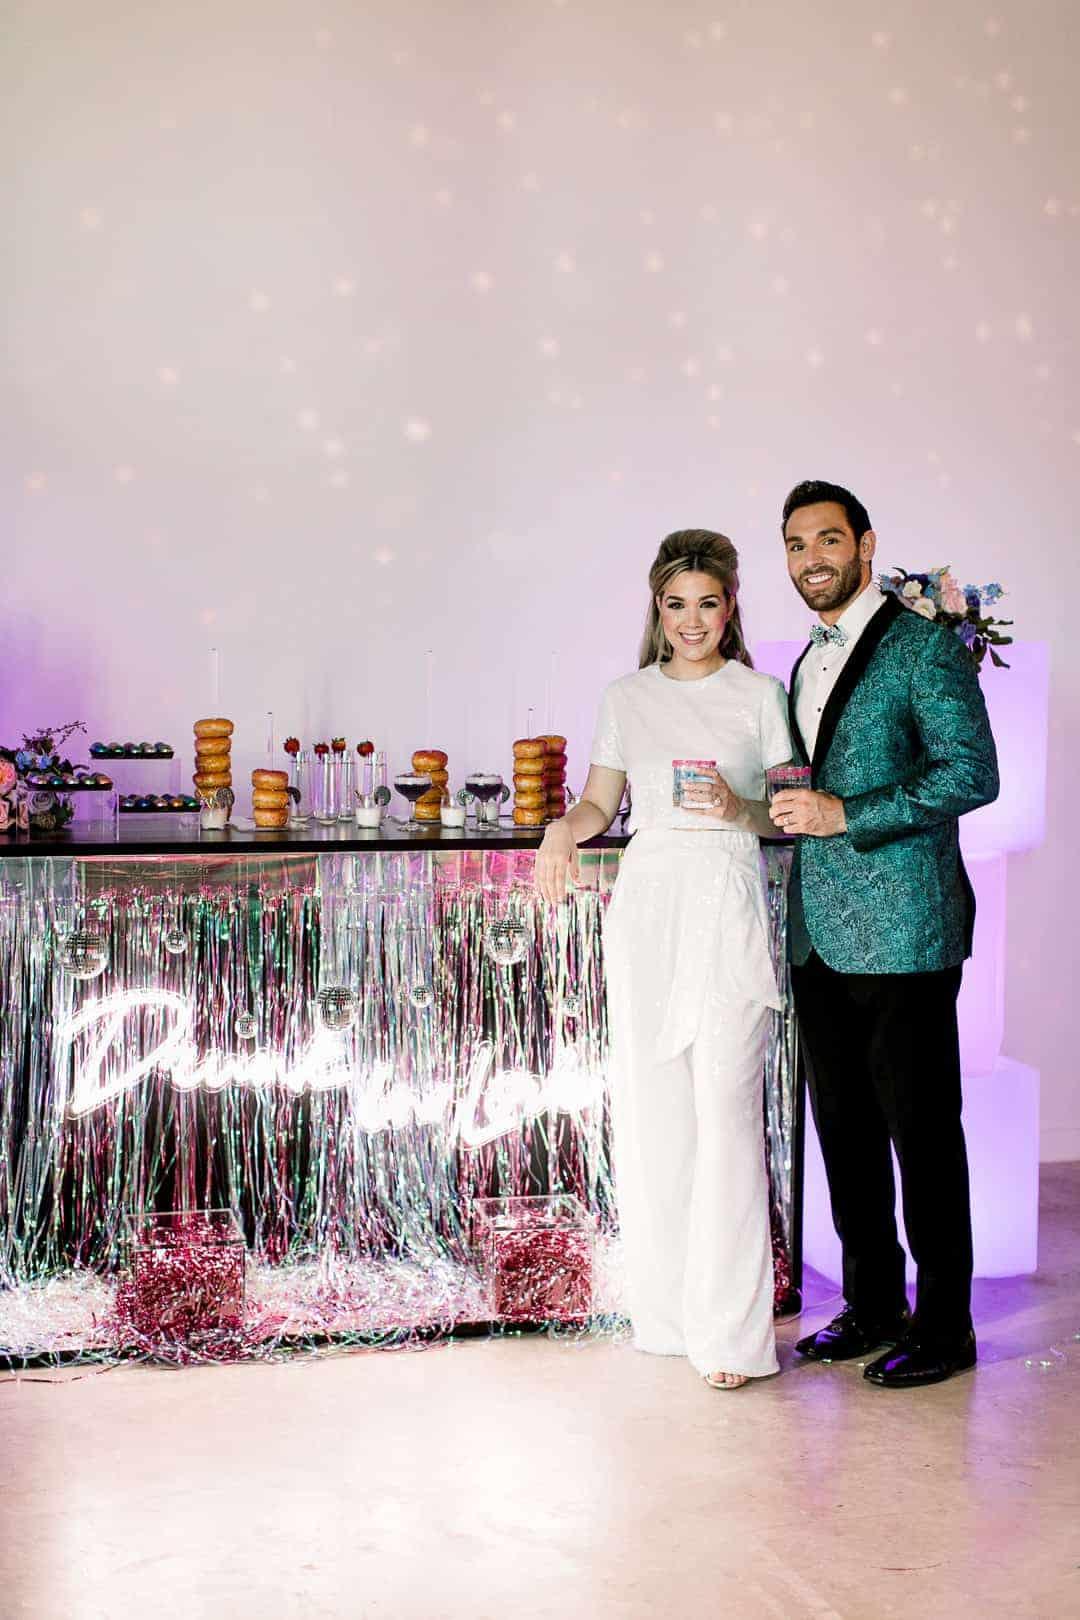 GROOVY GLAMOROUS WEDDING DONUT BAR